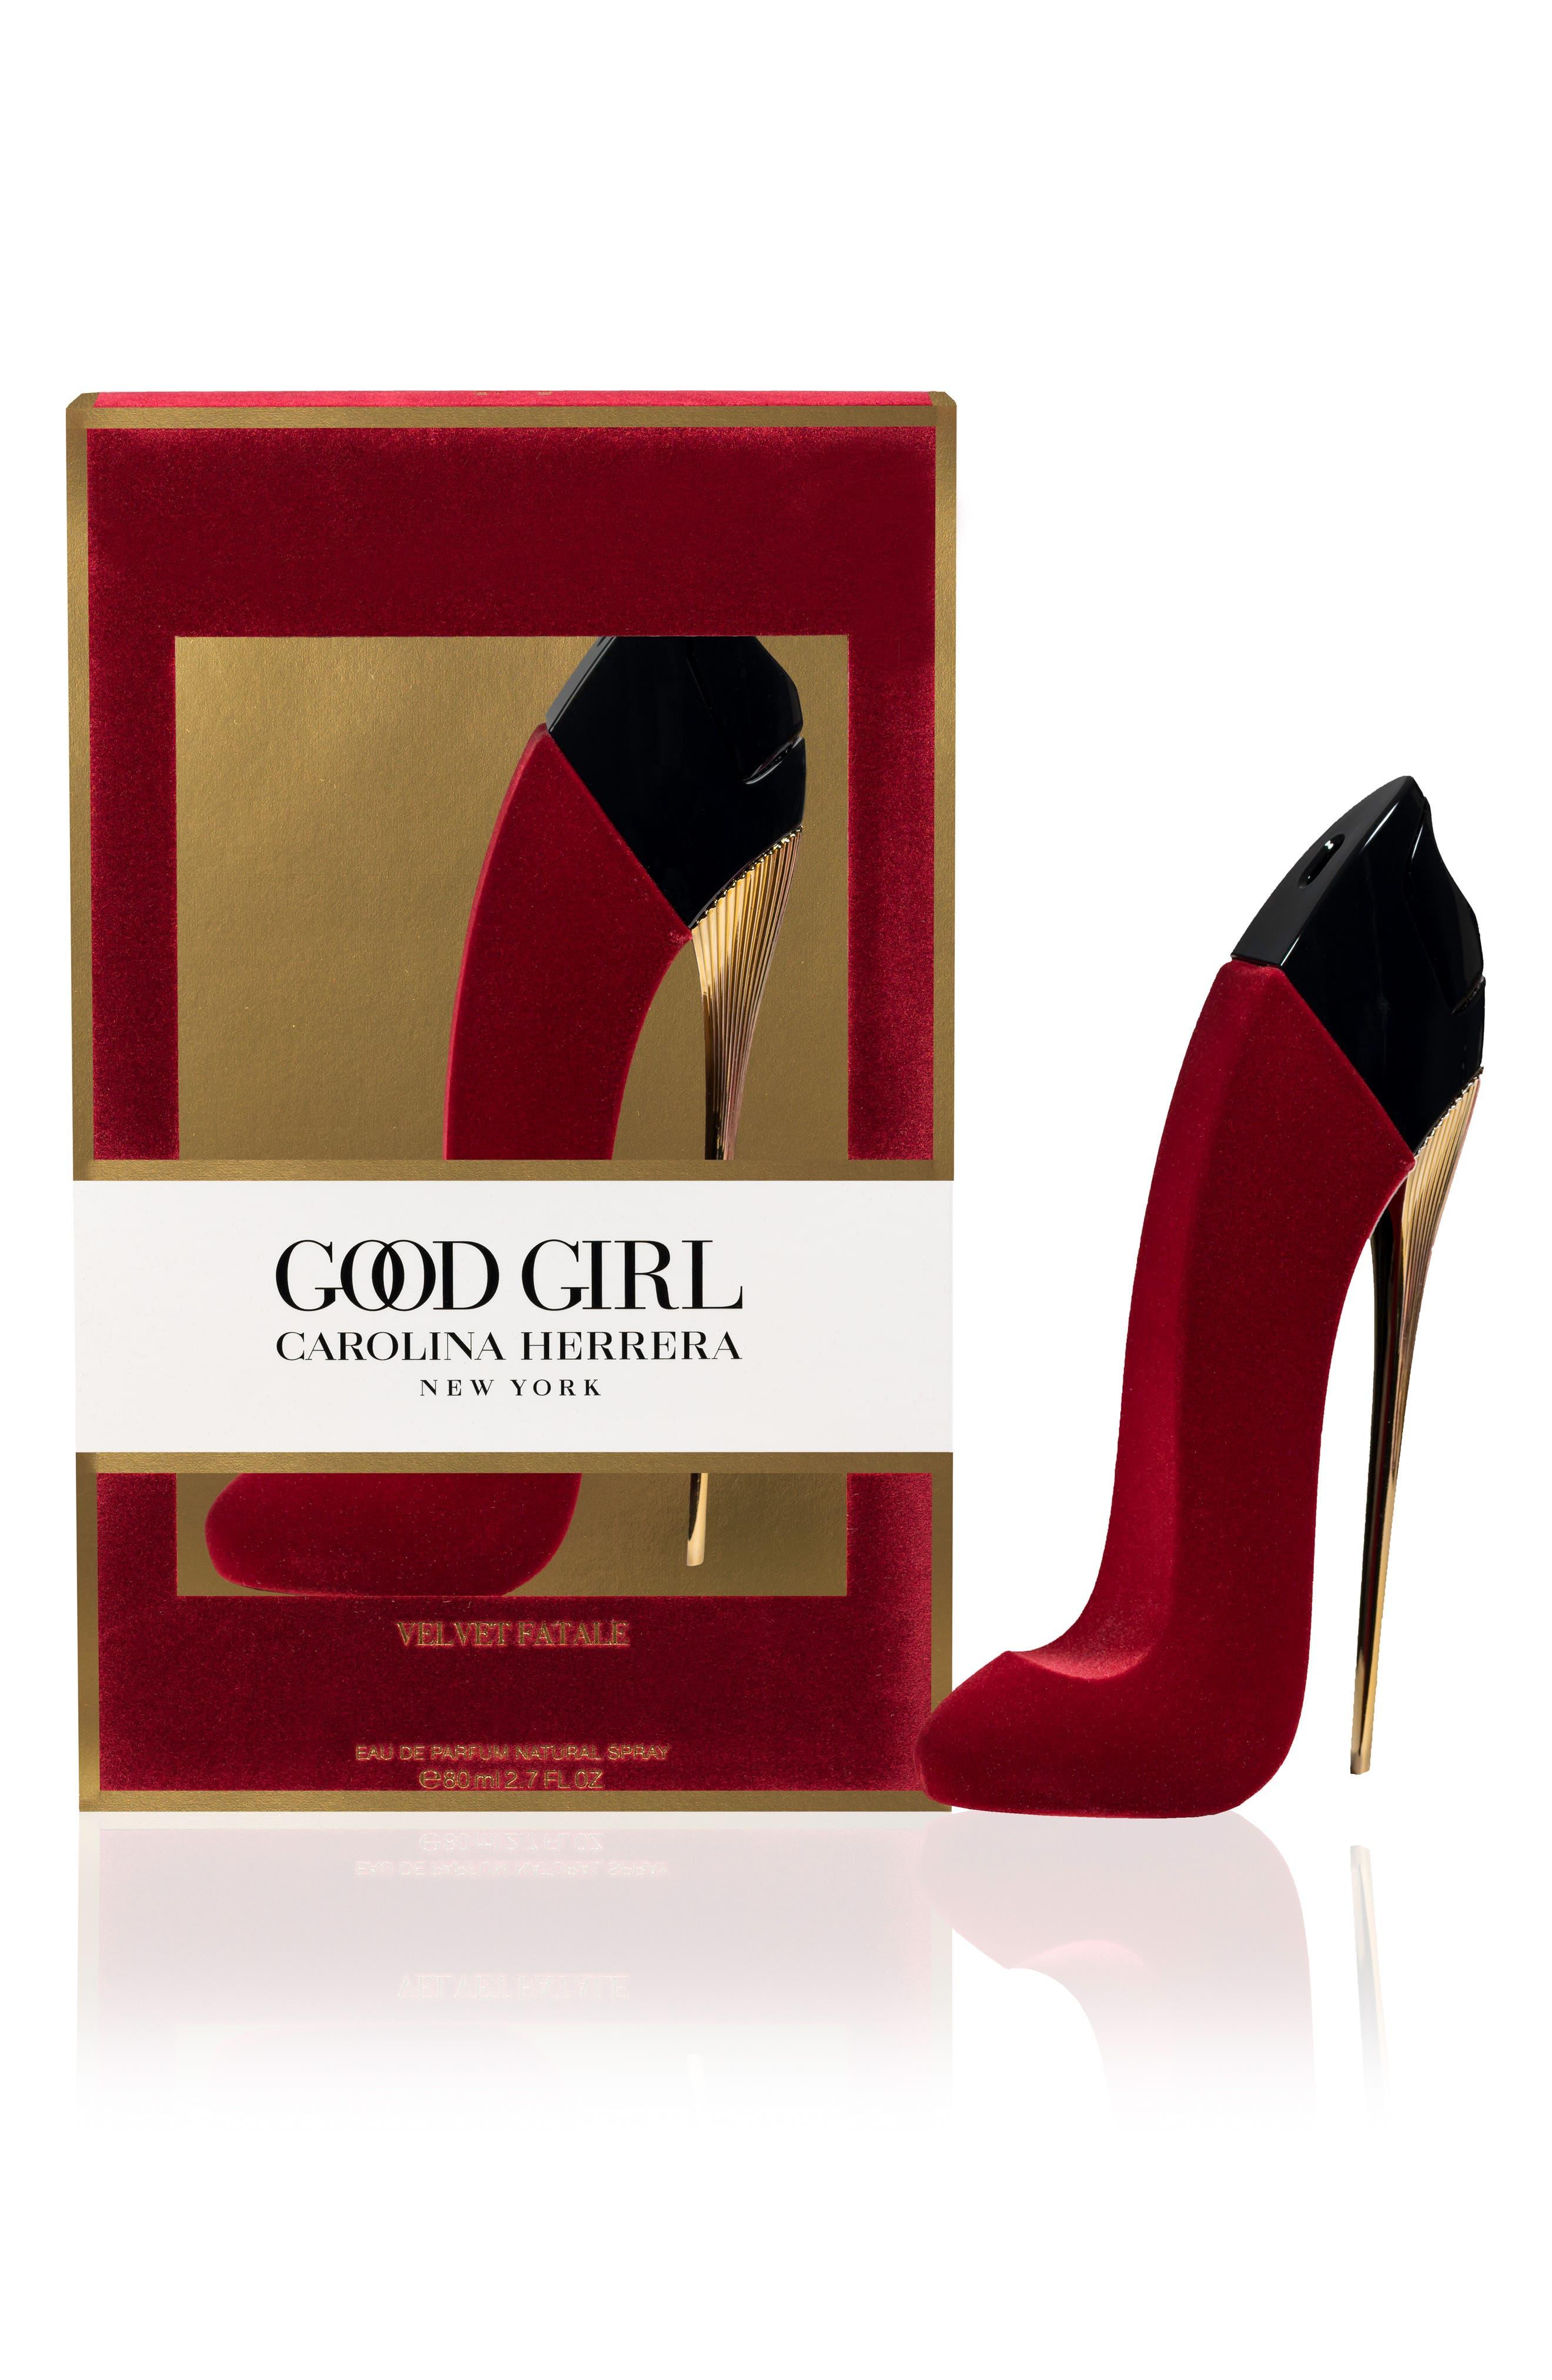 CAROLINA HERRERA,                             Good Girl Velvet Fatale Eau de Parfum Collector Edition,                             Alternate thumbnail 2, color,                             000